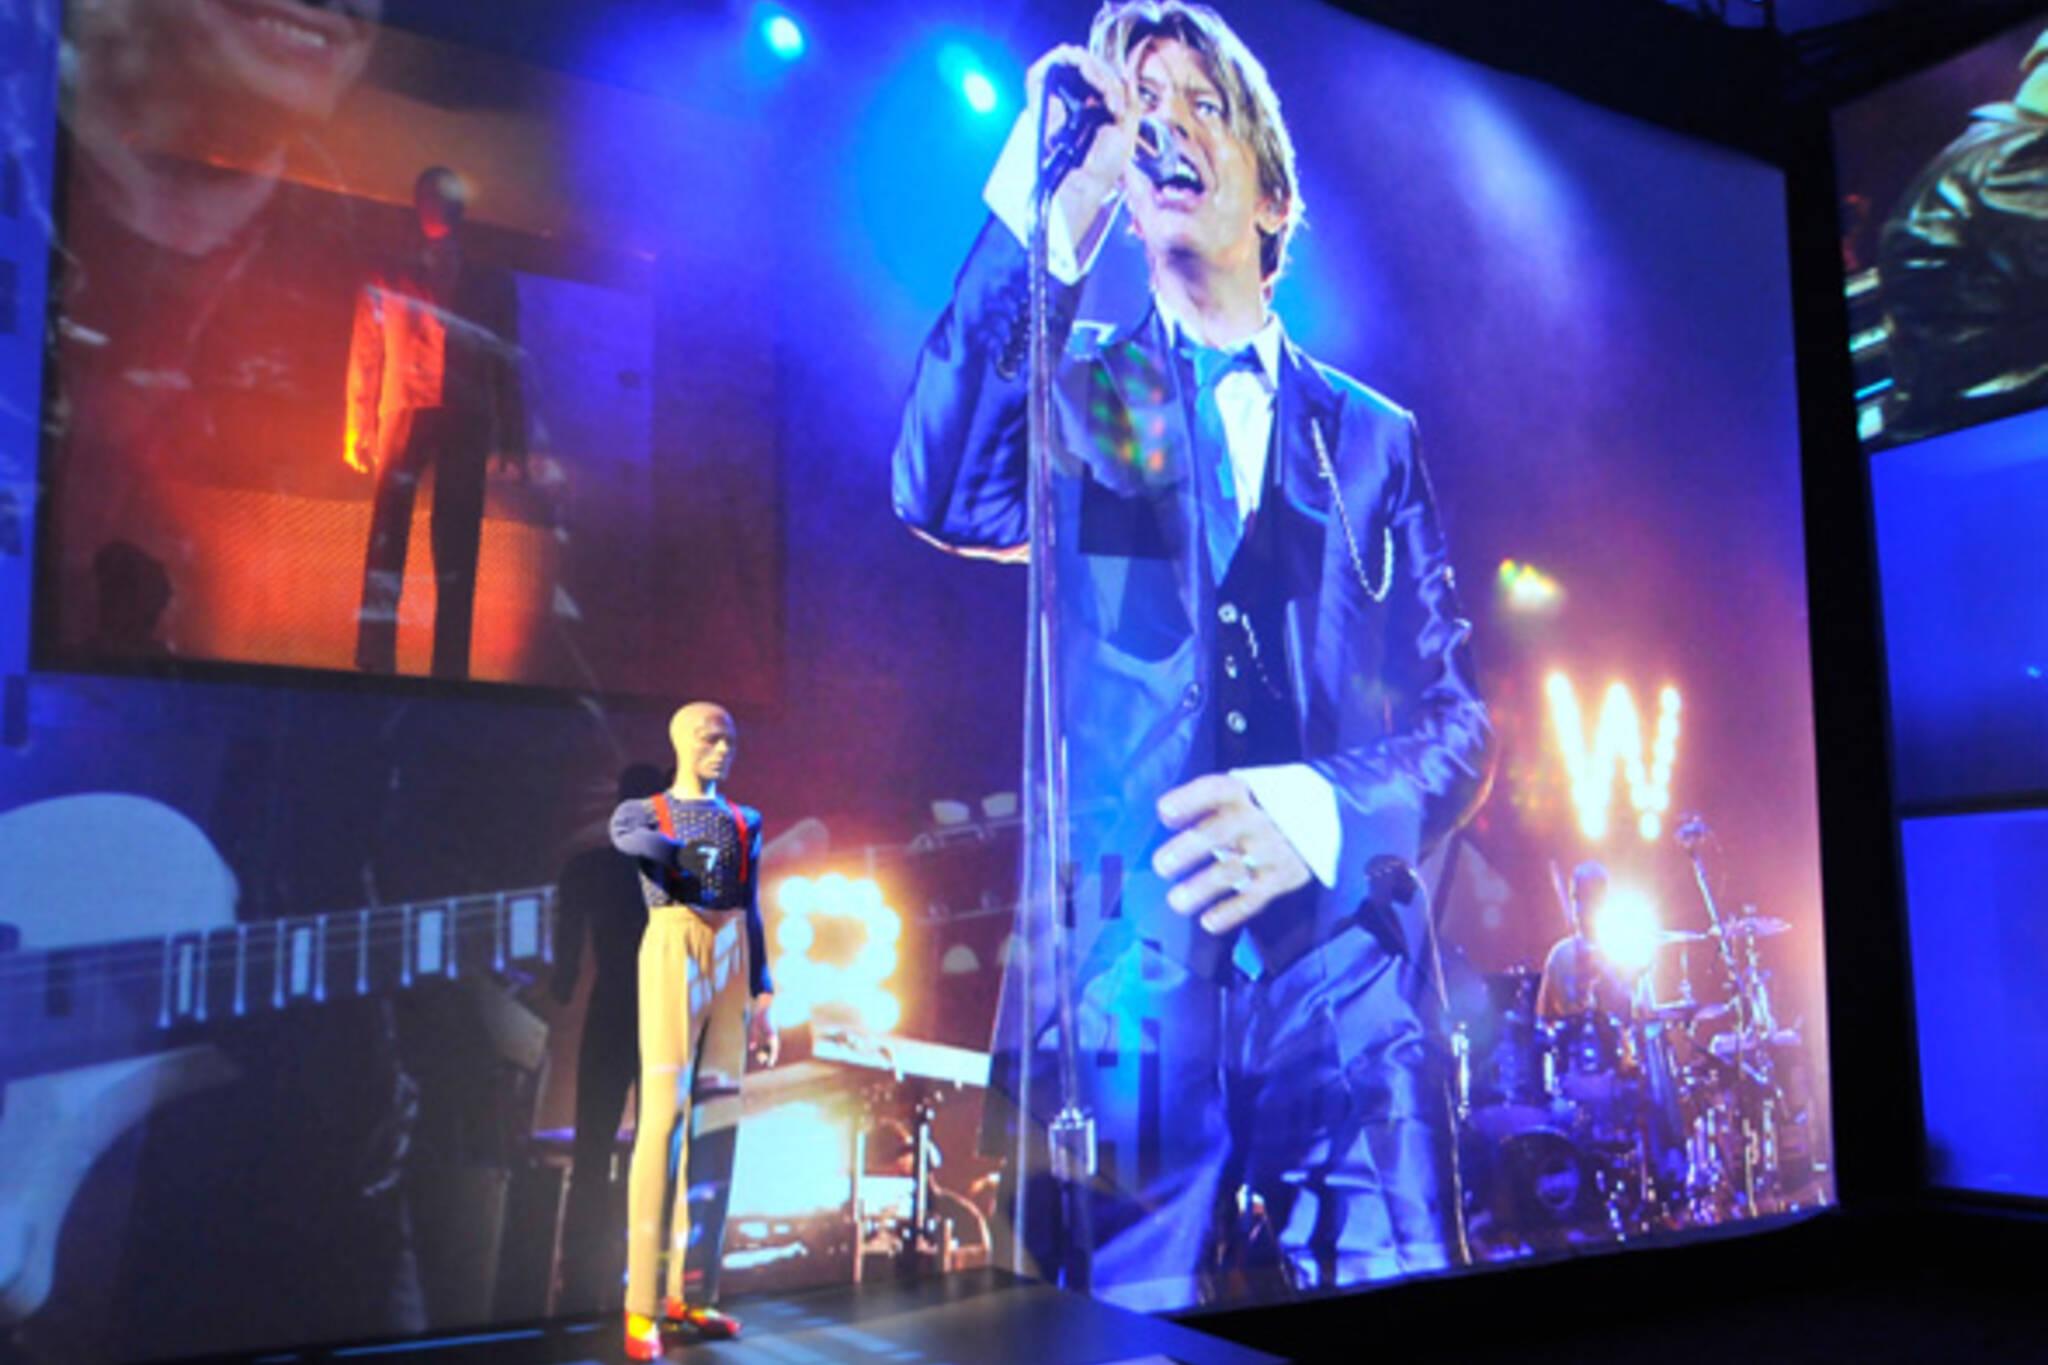 David Bowie AGO Toronto